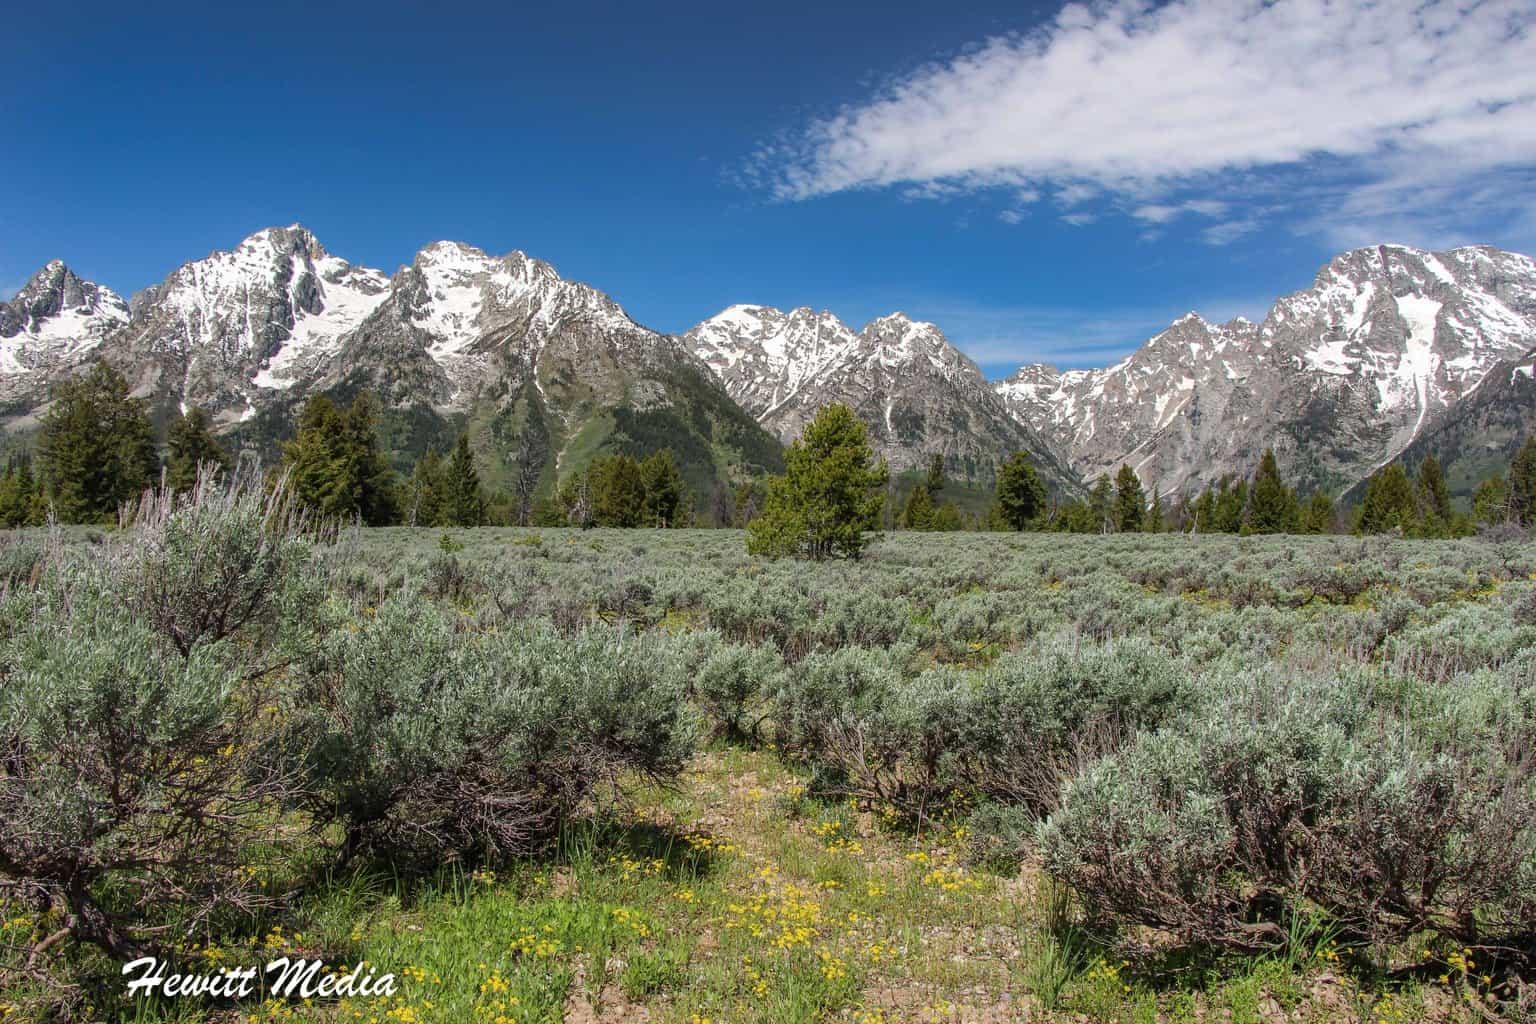 The Grand Teton Range